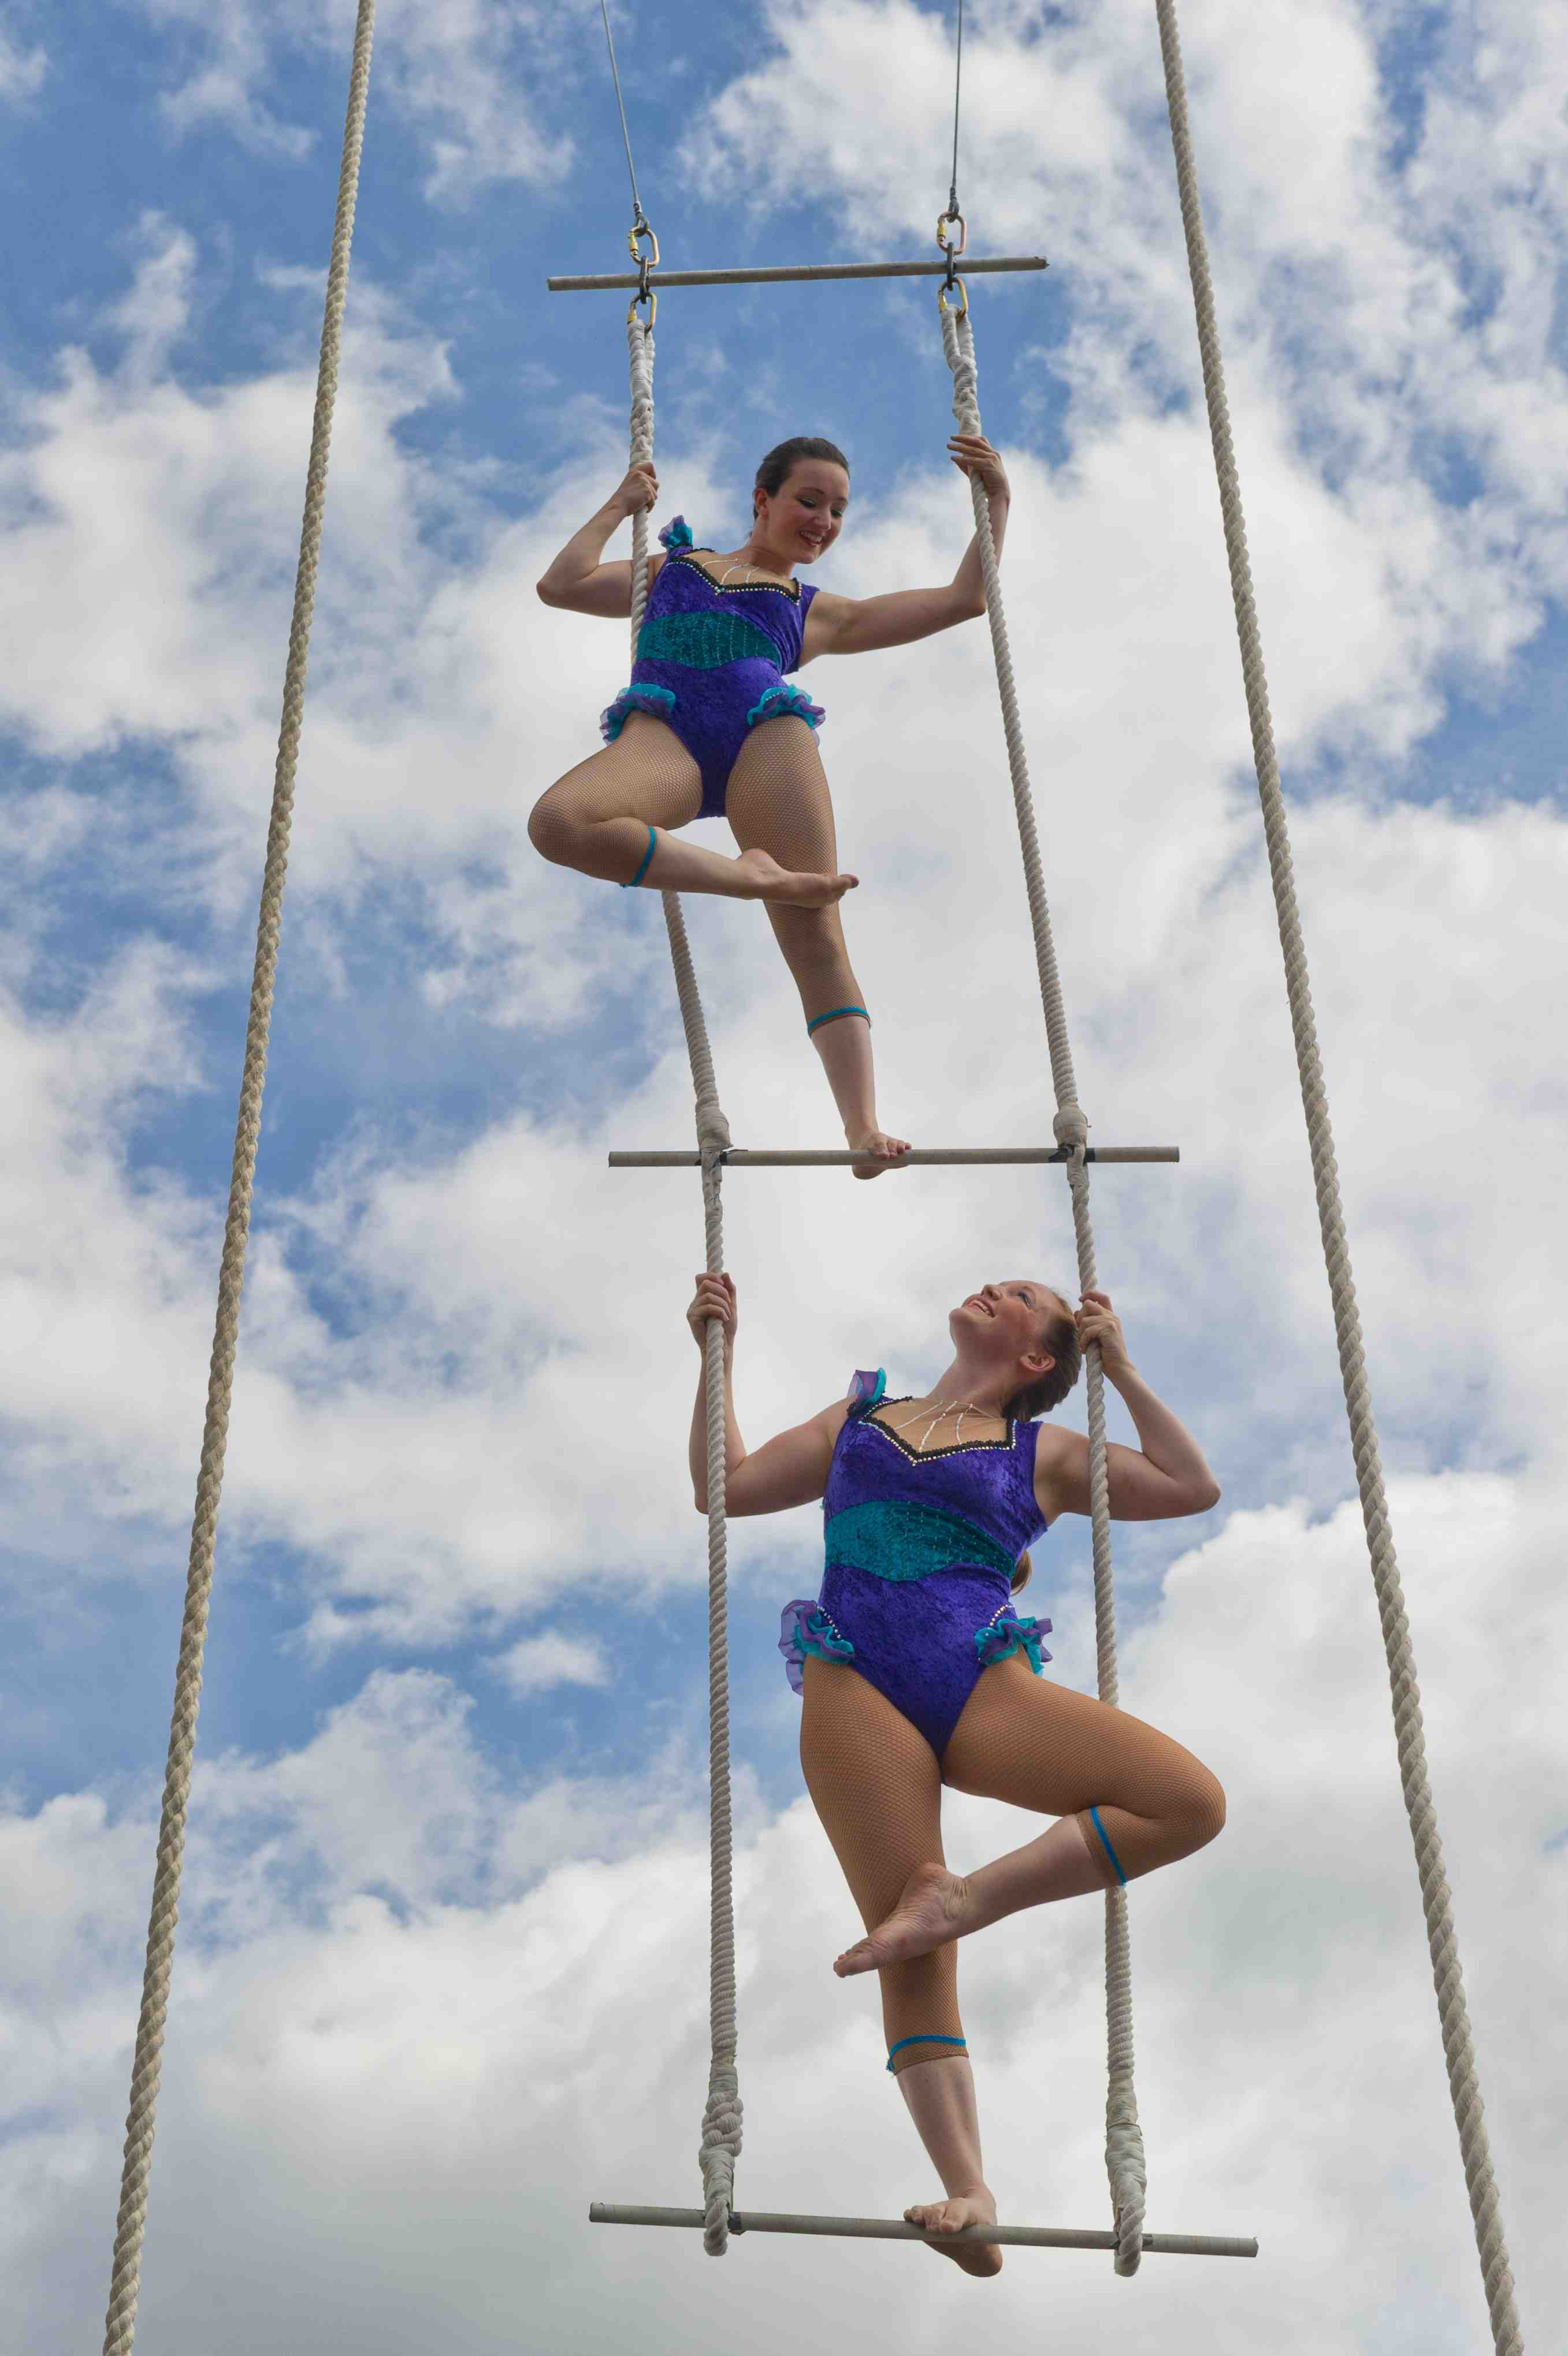 three-high trapeze vintage circus